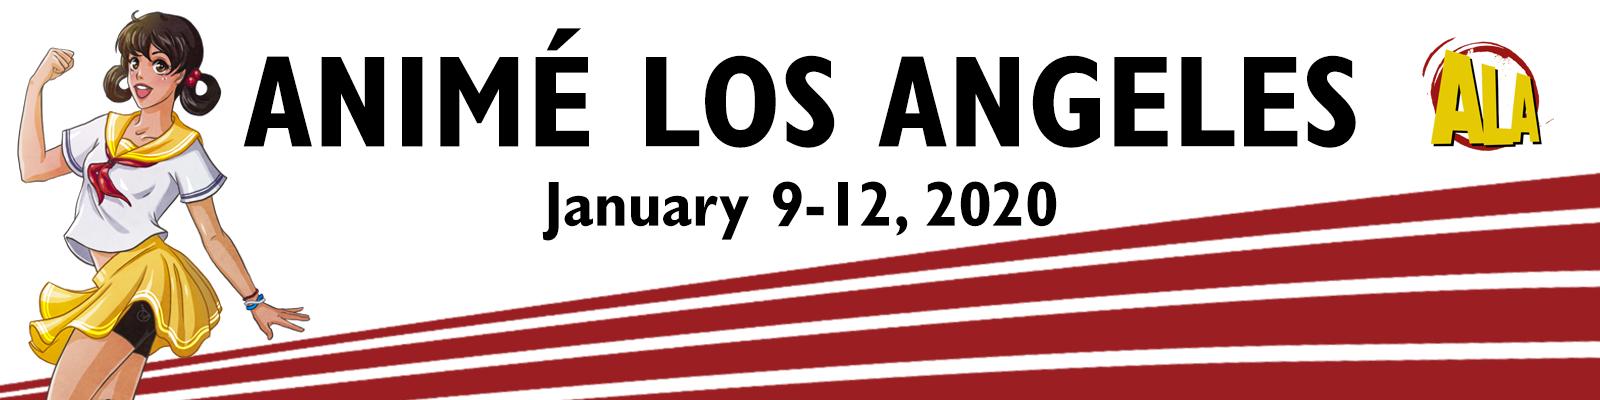 Anime Los Angeles